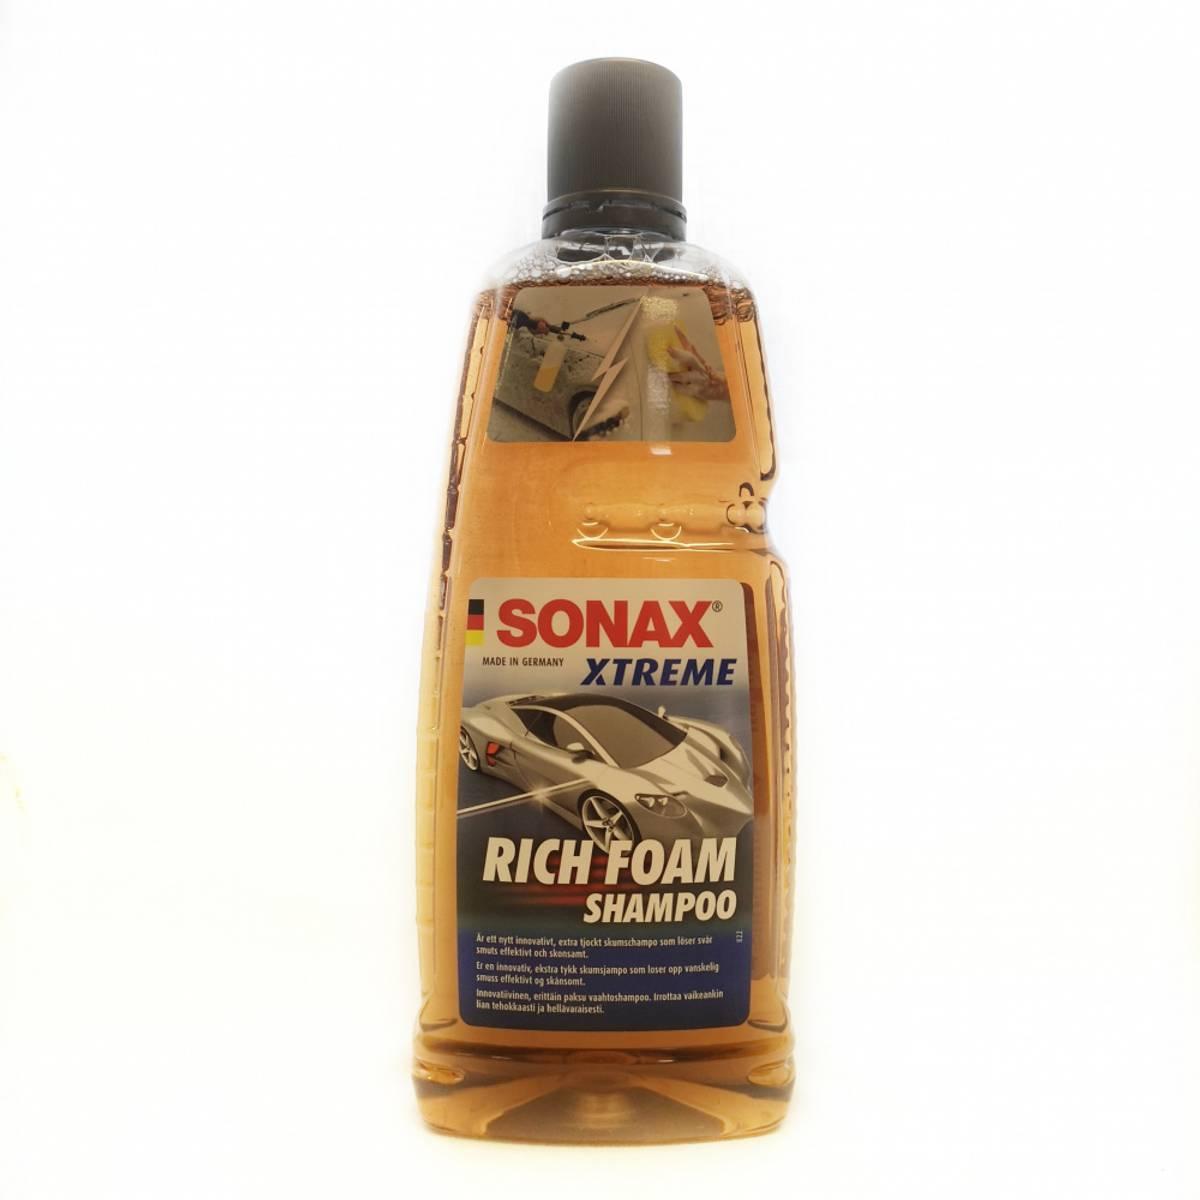 Sonax Rich Foam Shampoo